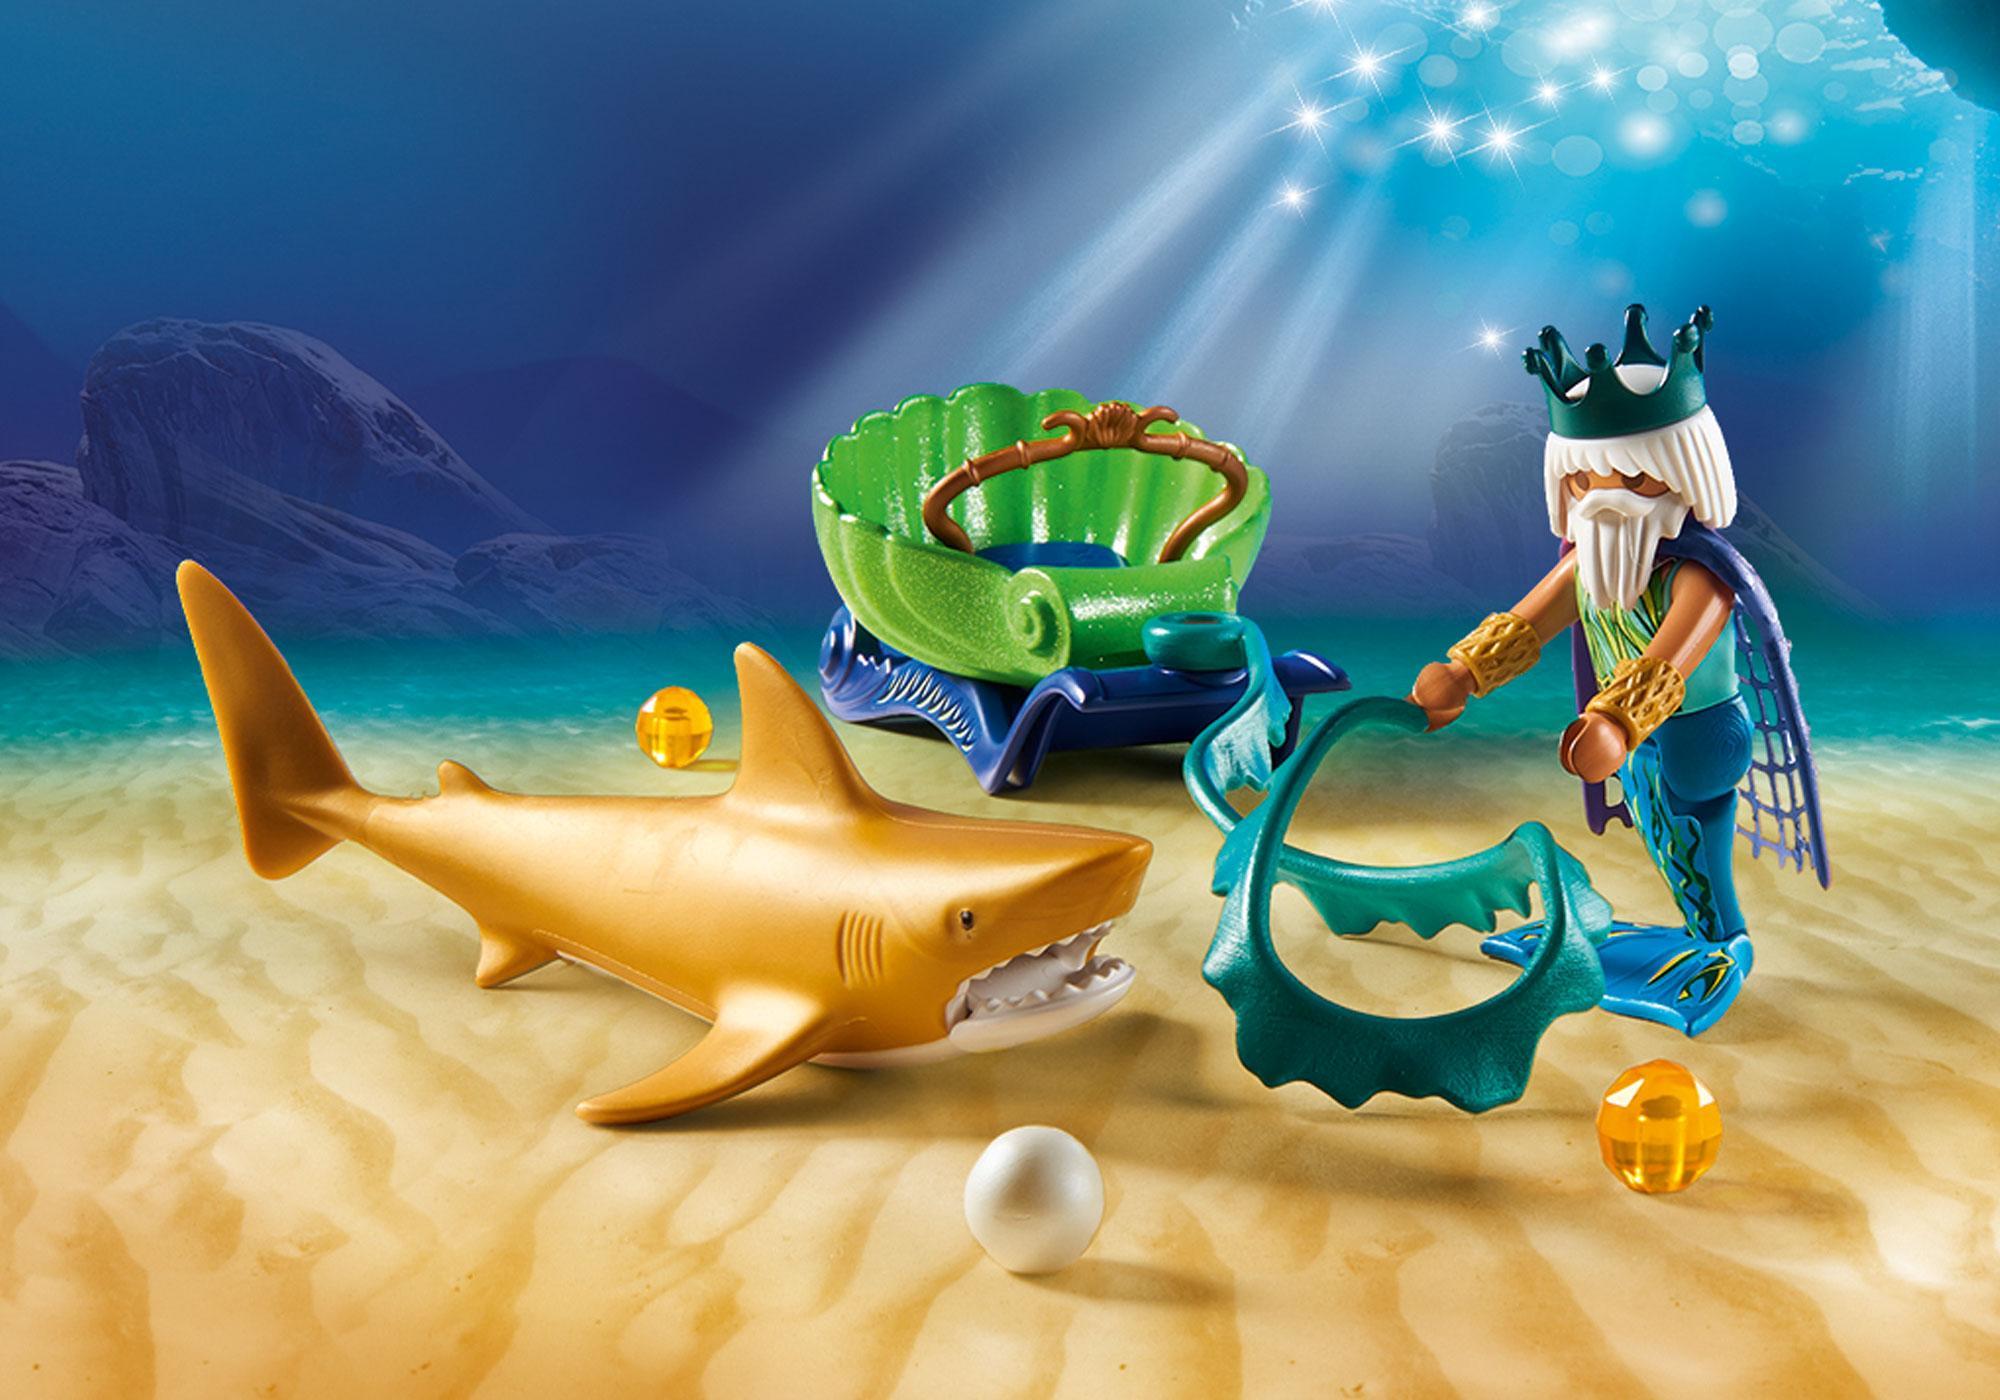 http://media.playmobil.com/i/playmobil/70097_product_extra1/Koning der zeeën met haaienkoets